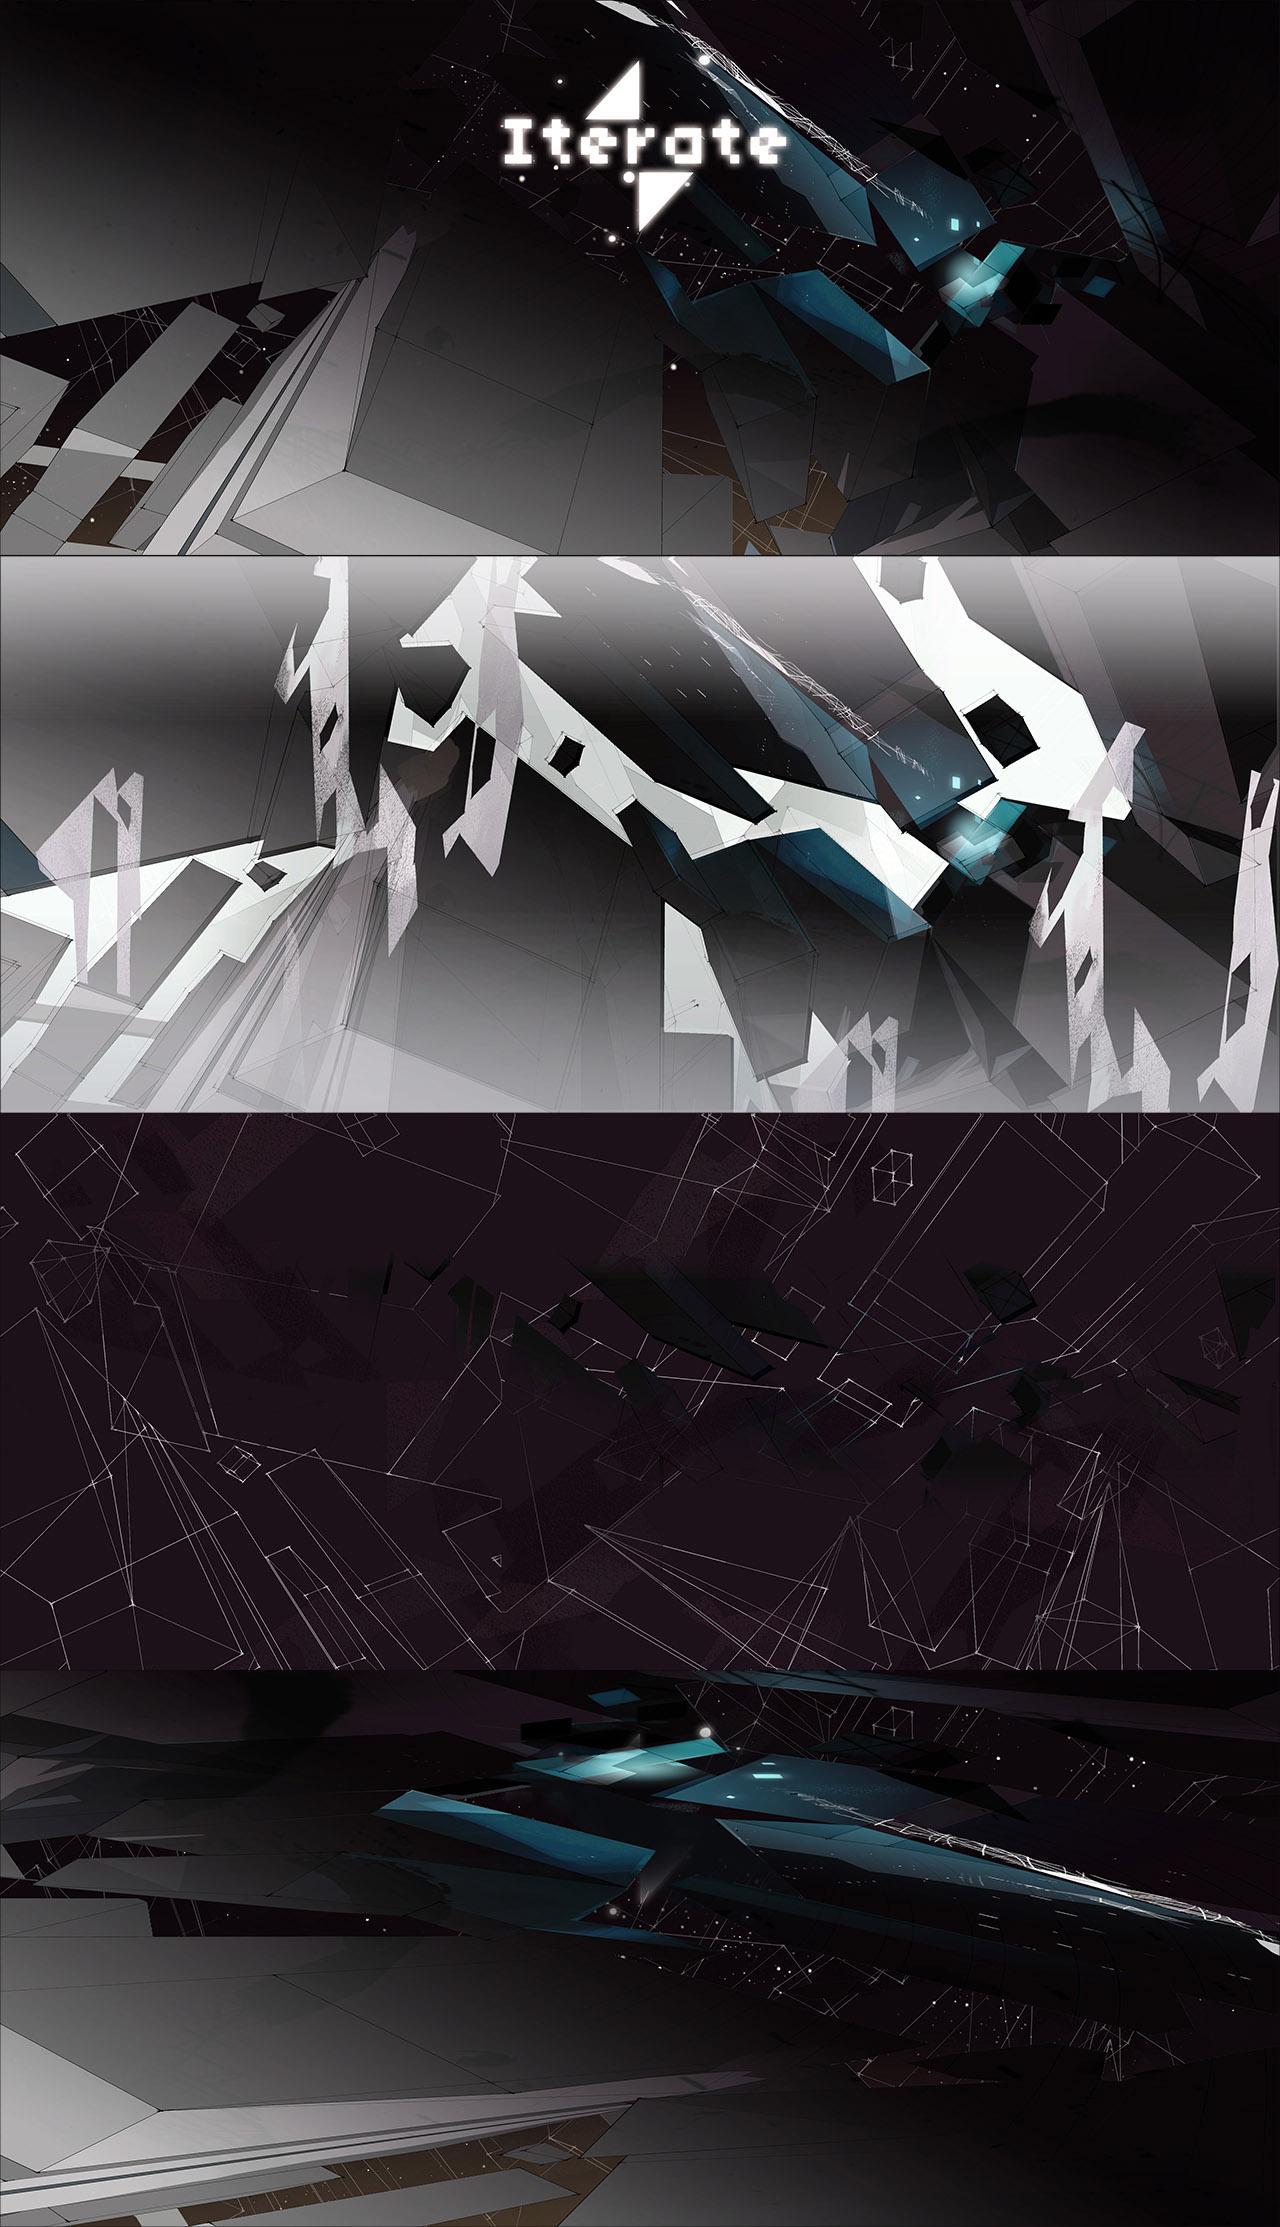 Ludum Dare - Iterate backgrounds (2)